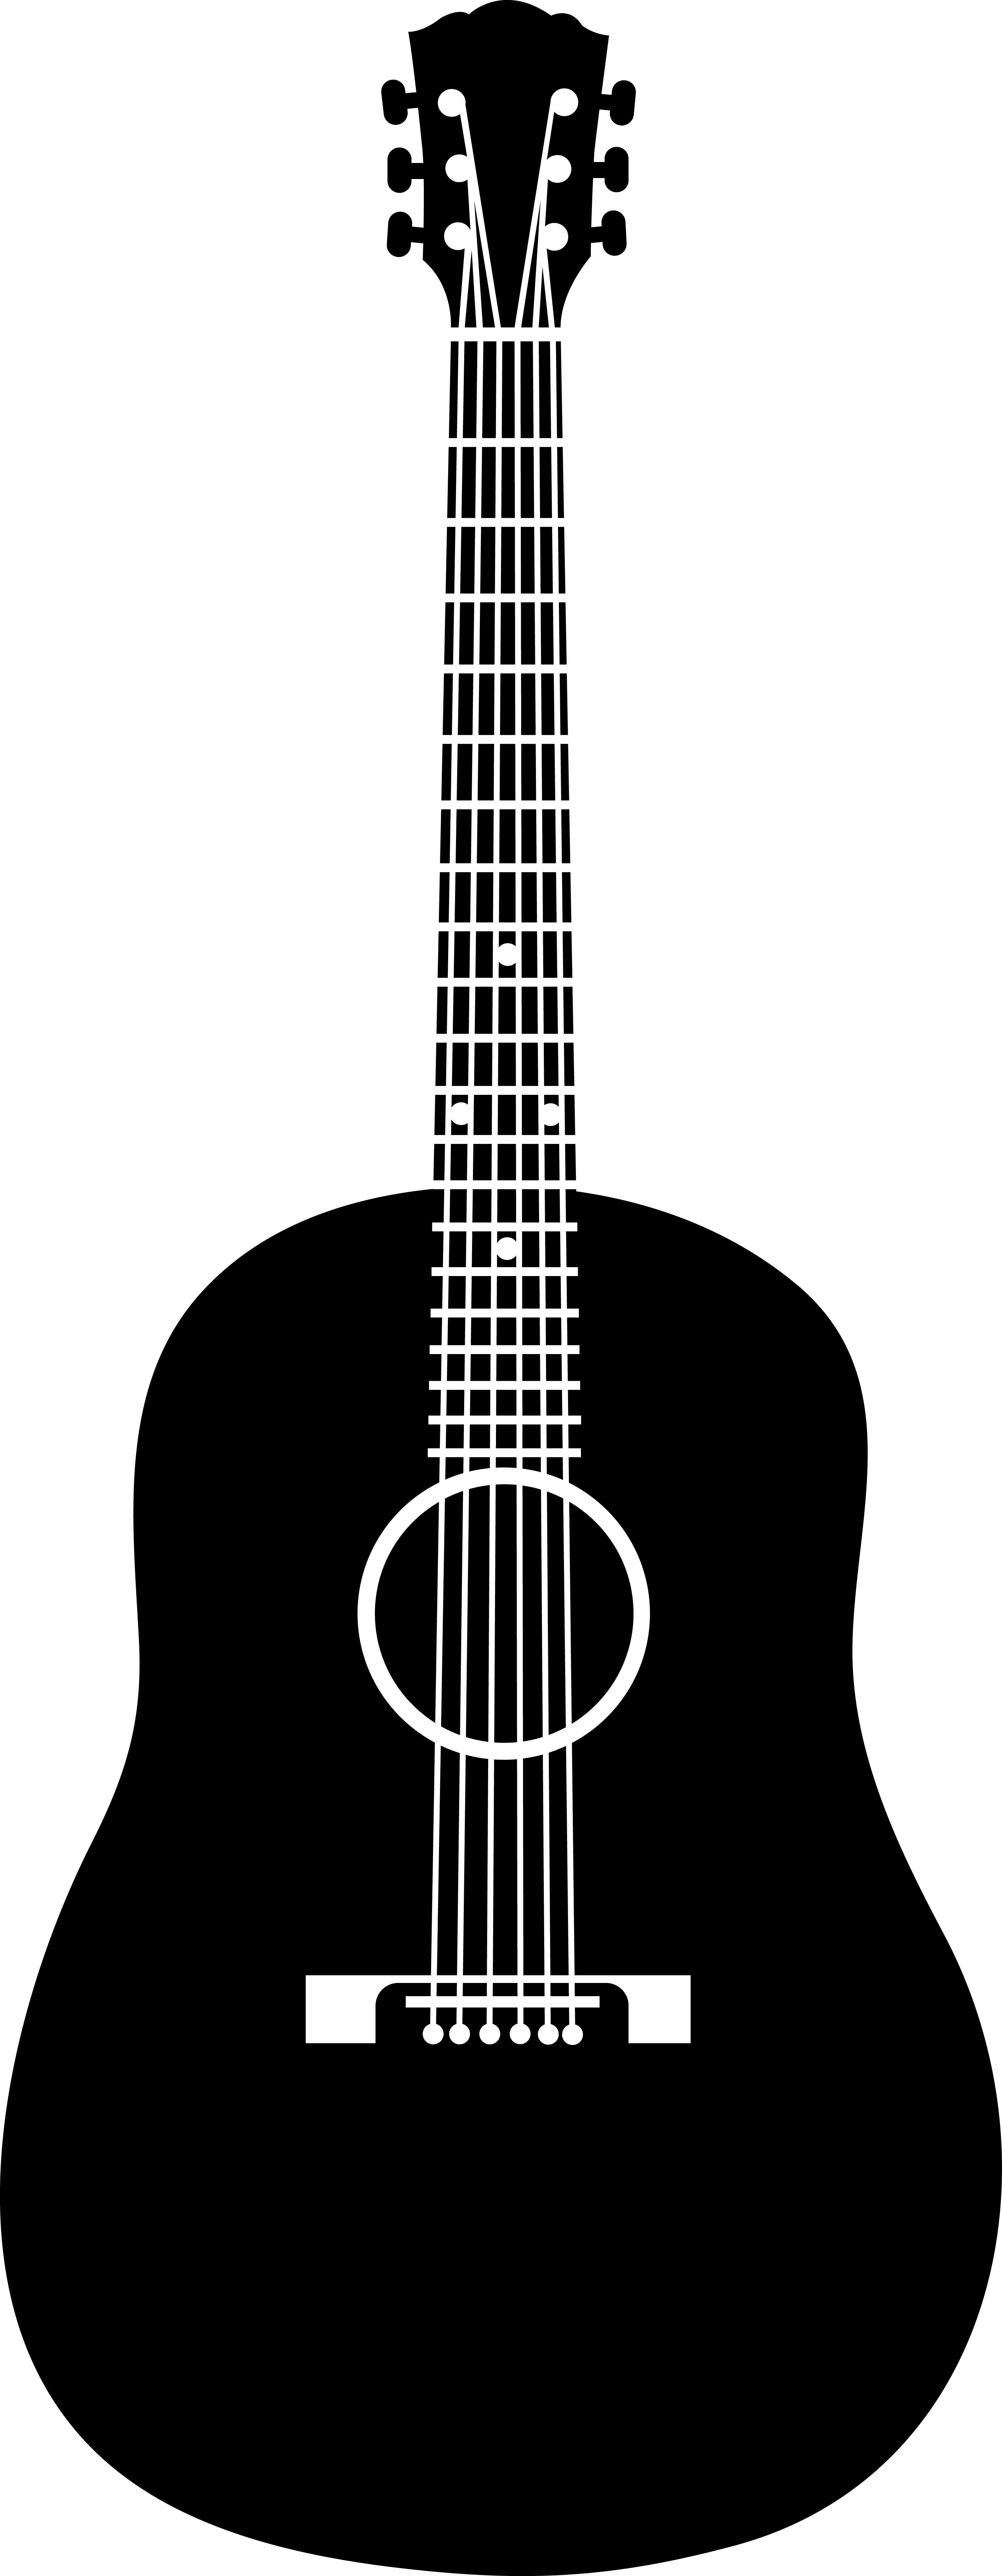 clipart transparent download Acoustic clipart. Ukulele png black and